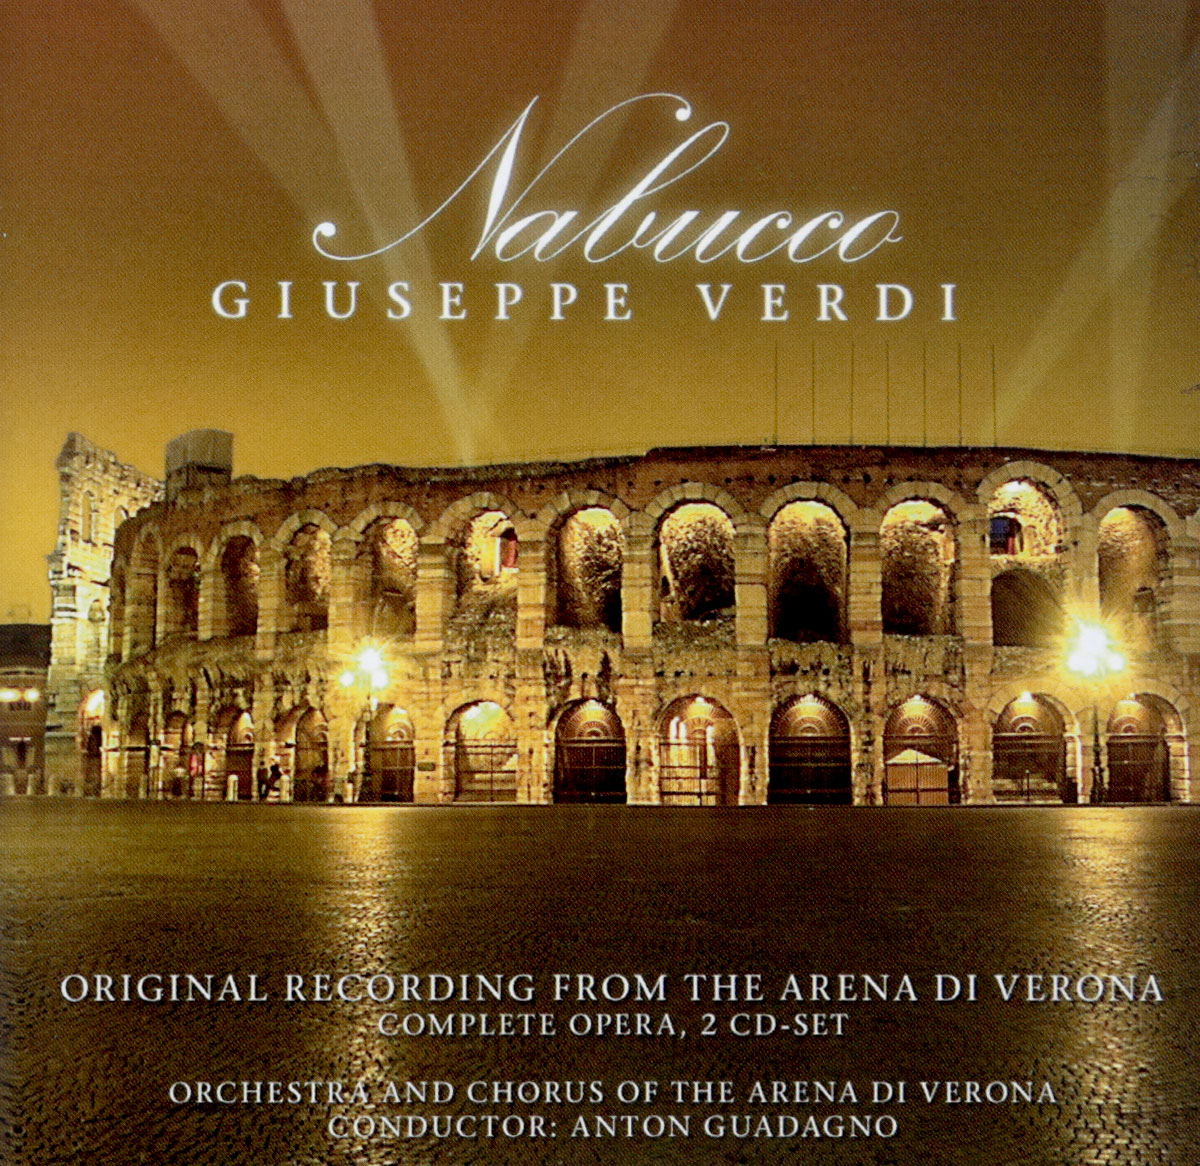 Джузеппе Верди,Паоло Силвери,Марио Бинси Giuseppe Verdi. Nabucco. Original Recording From The Arena Di Verona verdi nabucco arena di verona